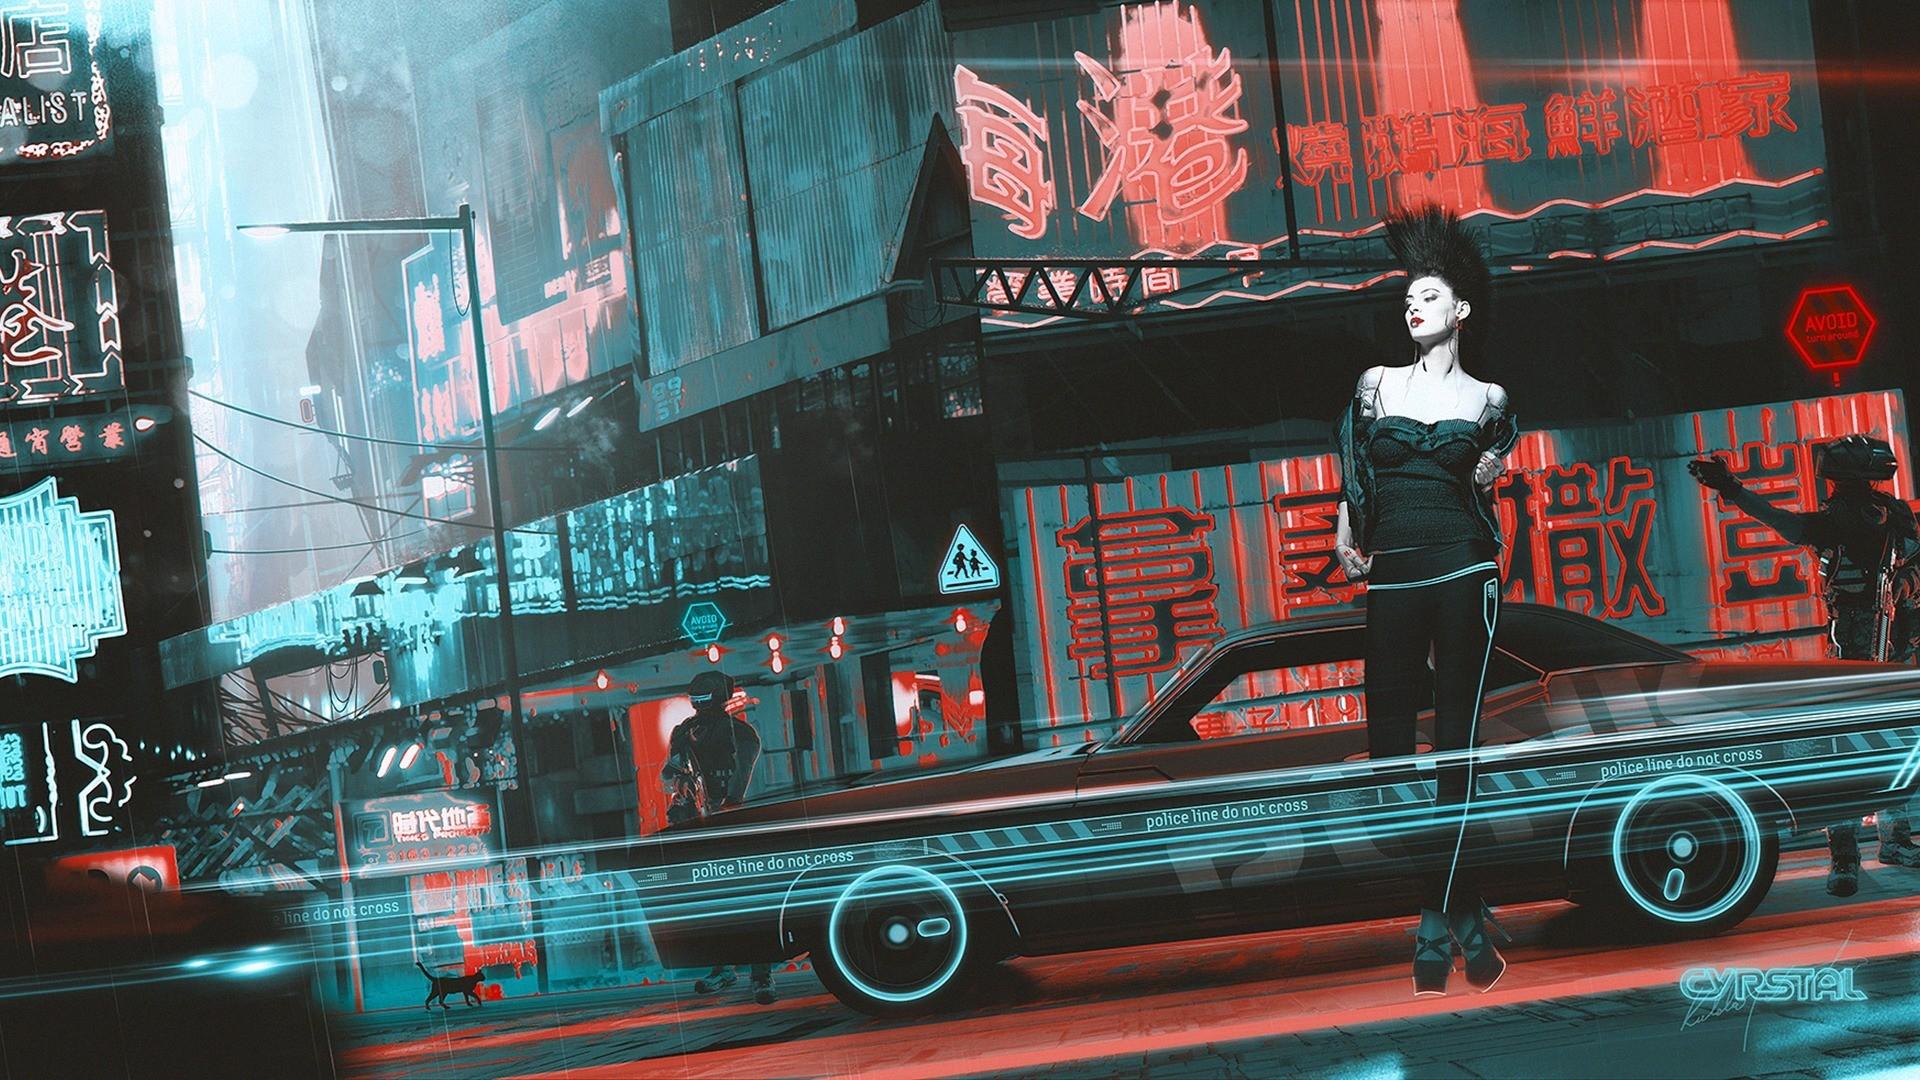 Car Wallpaper 1280x1024 Artwork Fantasy Art Cyberpunk Women China Town Kuldar